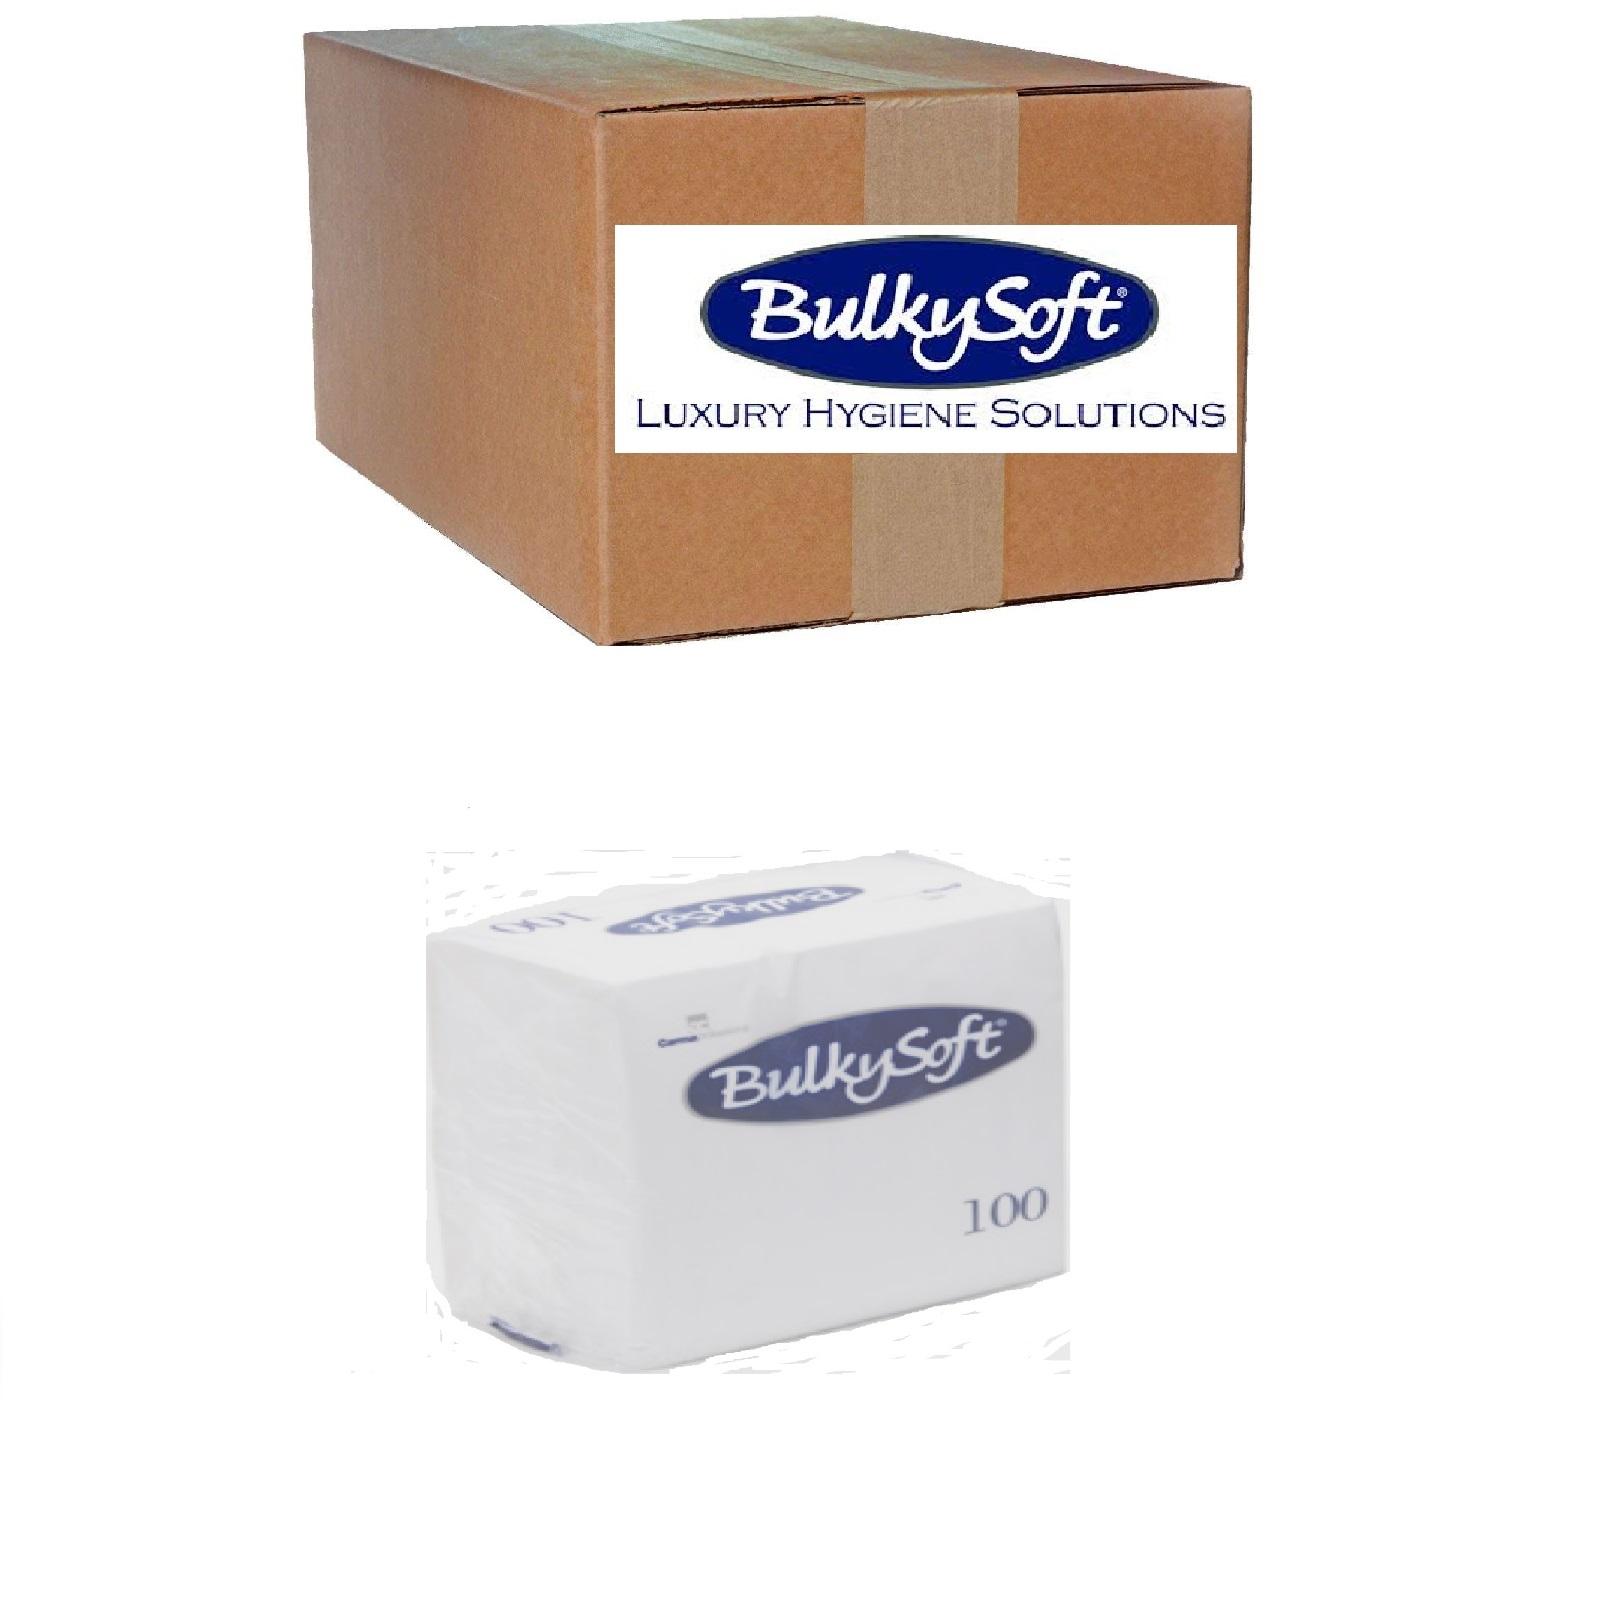 BulkySoft Servietten 1/4 Falz, Hochweiß 2-lg, Zell. 24 x 24 cm, 30 x 100 Stk.